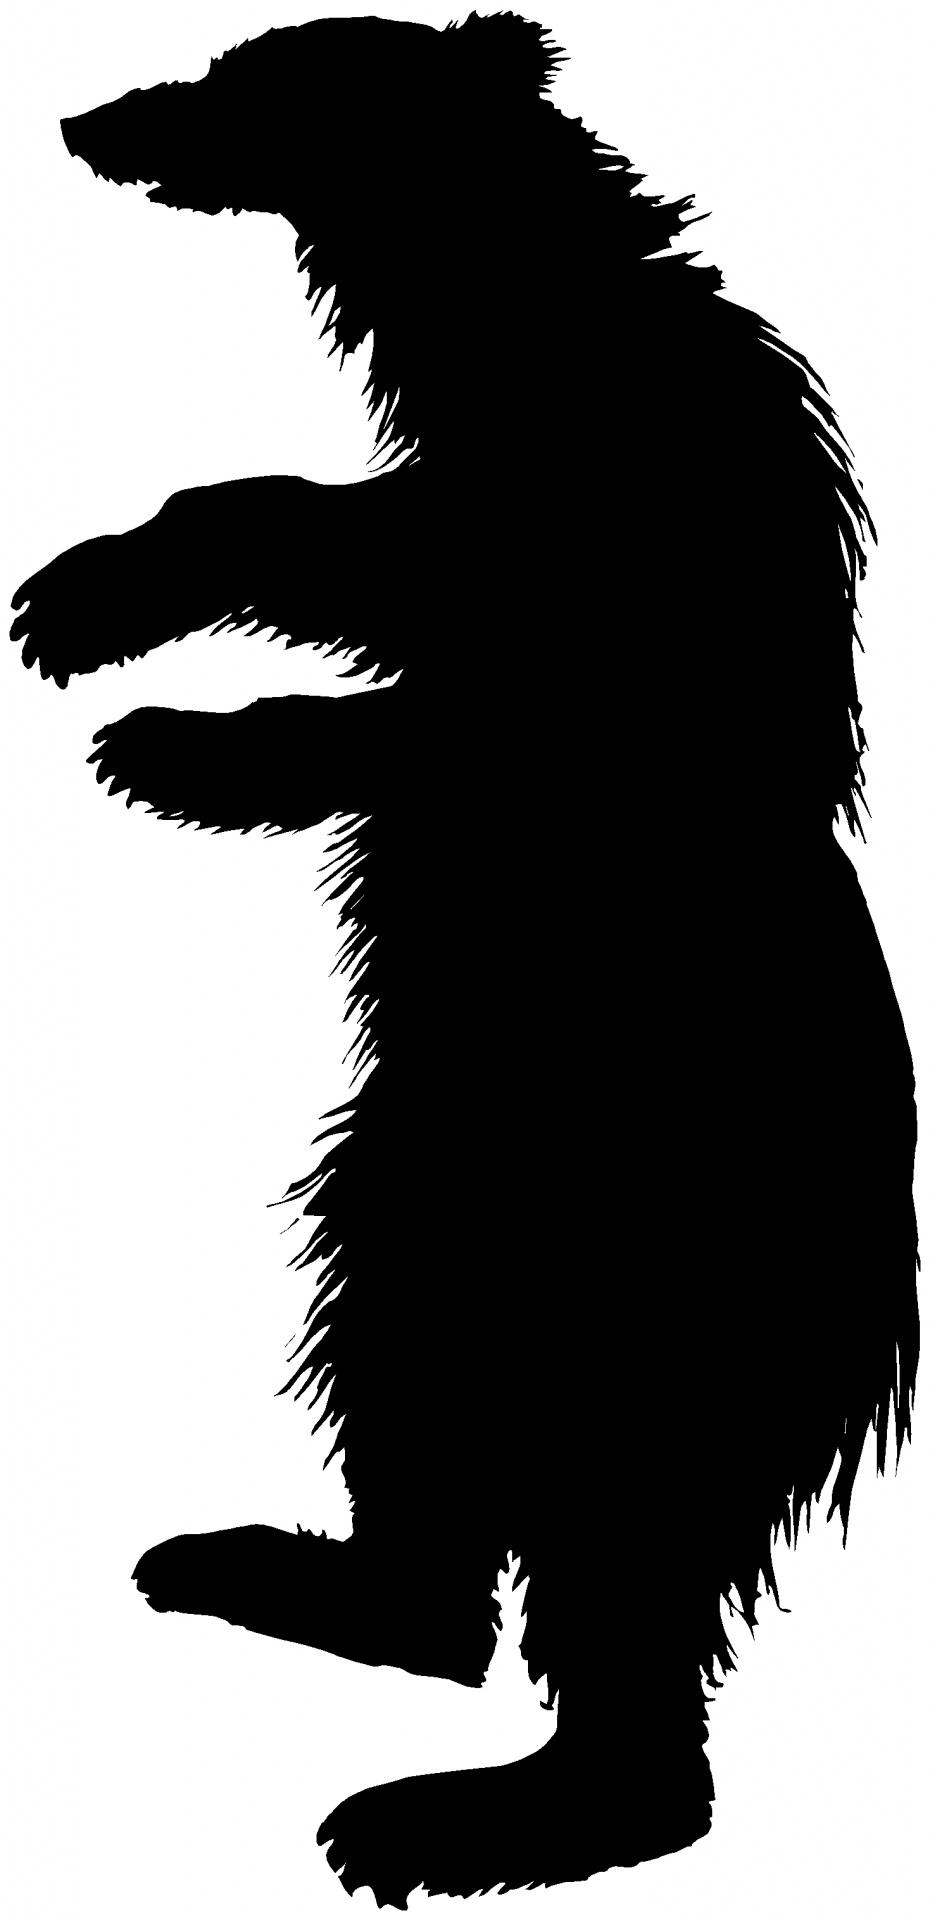 930x1920 Silhouette Of An Animal Free Stock Photo